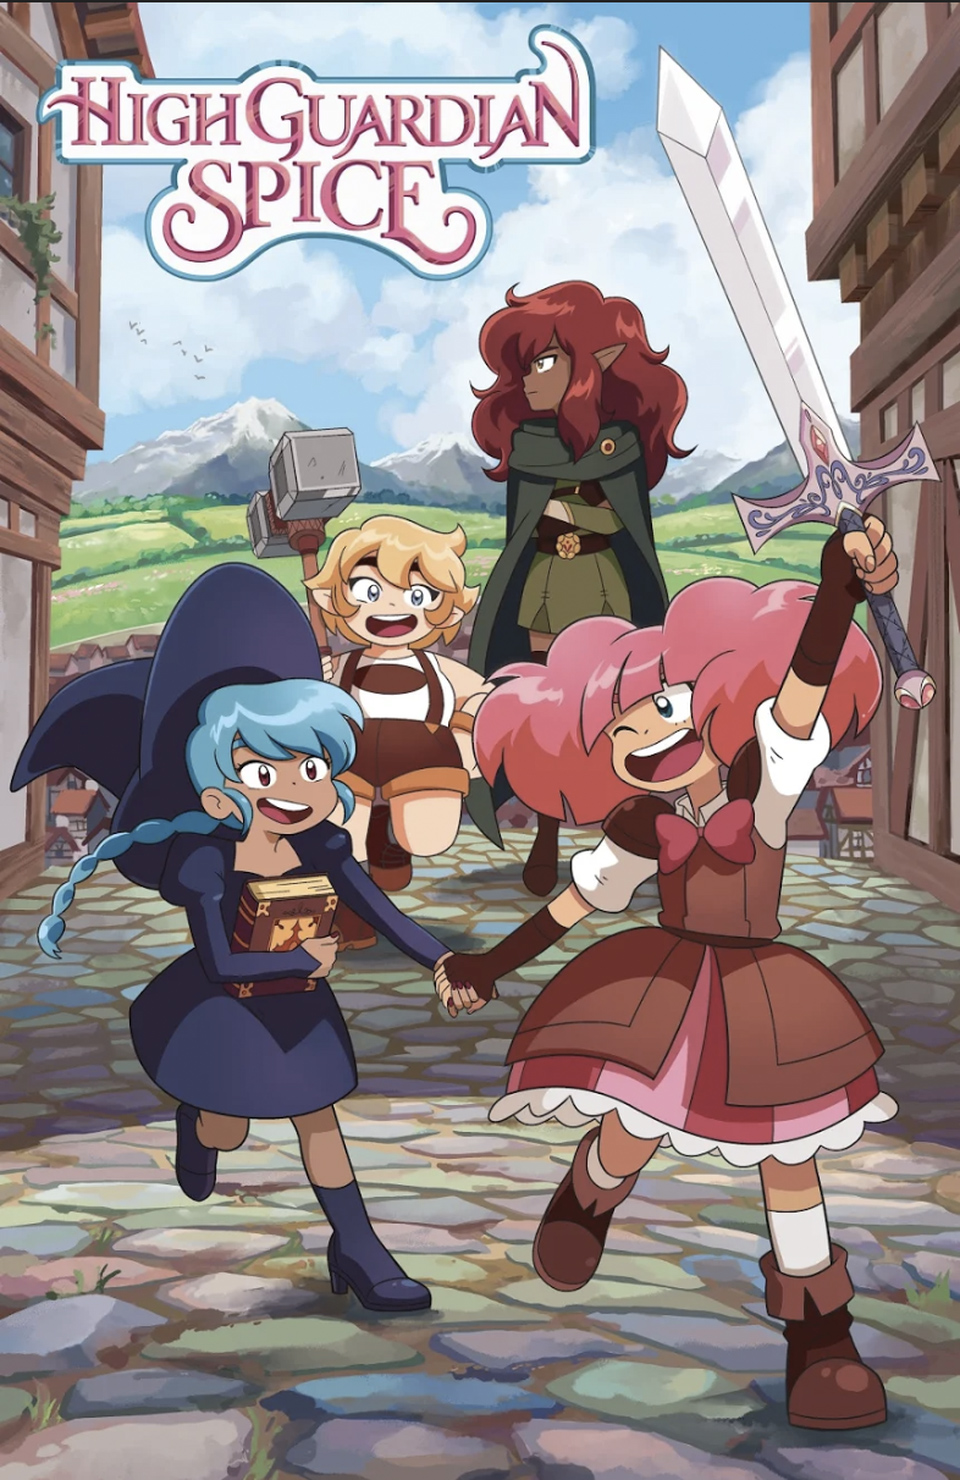 Crunchyroll Parent Company Announces Original Animation Division, High Guardian Spice Anime